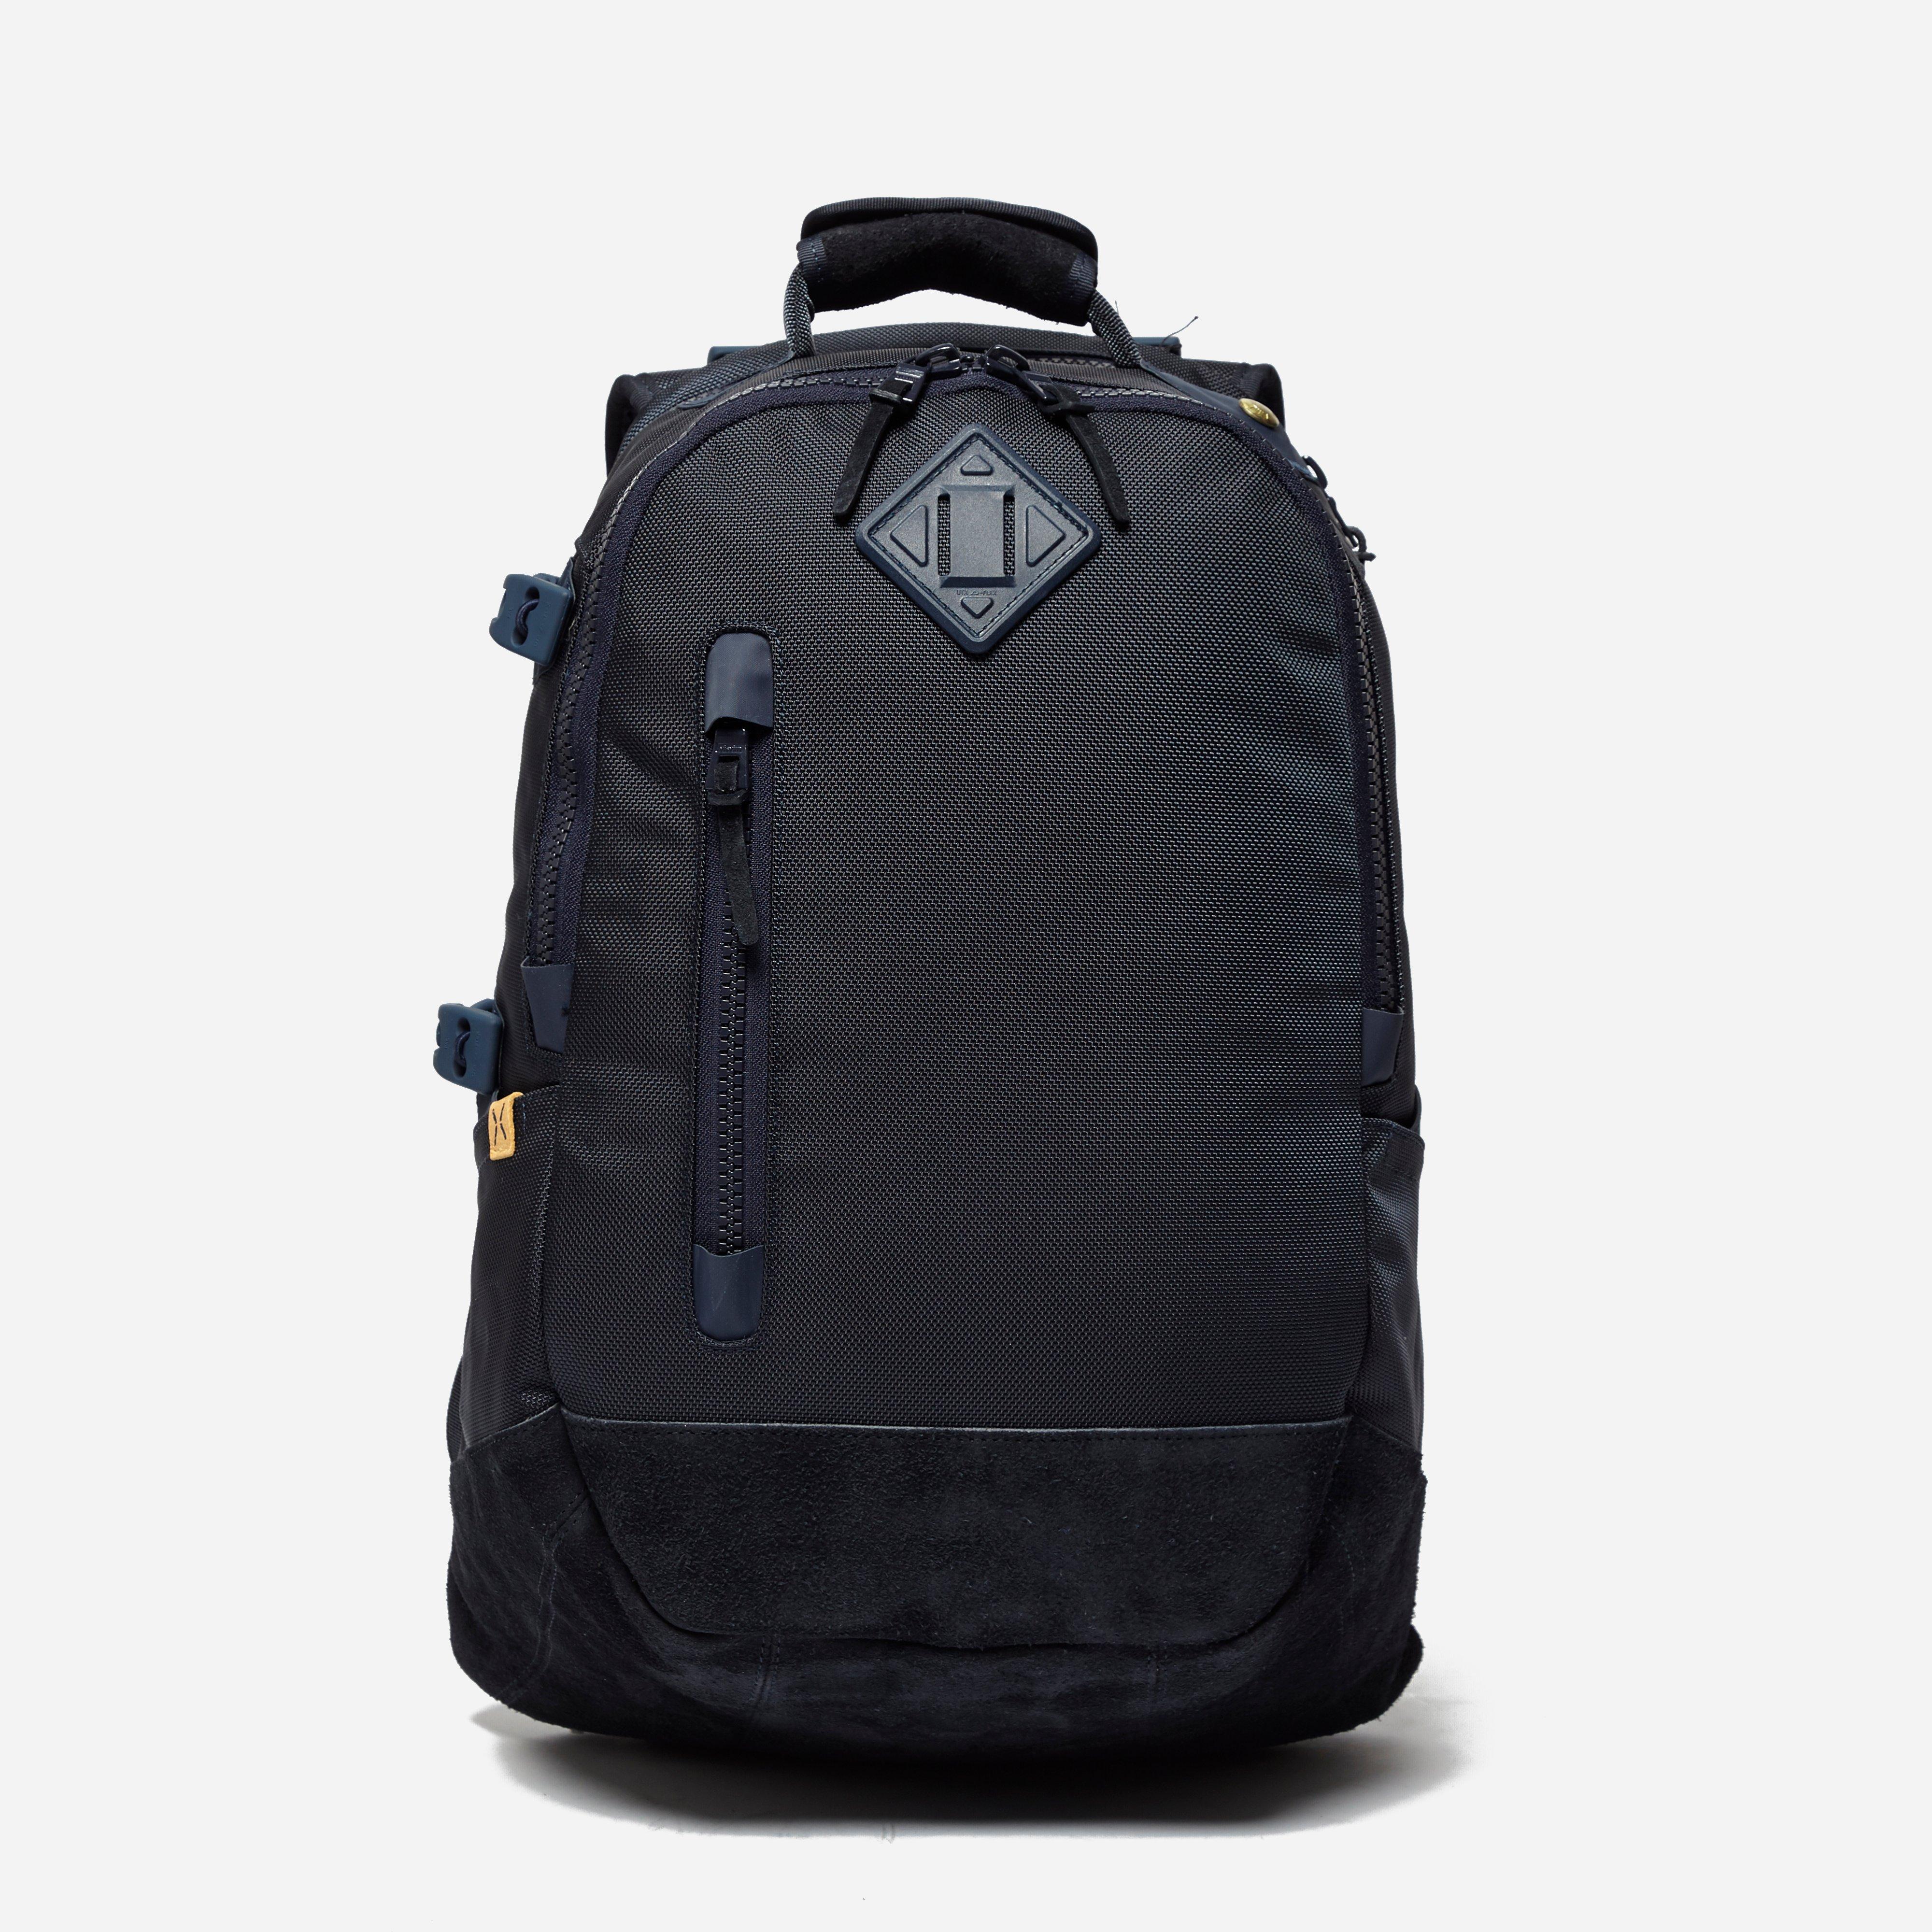 Visvim Ballistic 20L Backpack